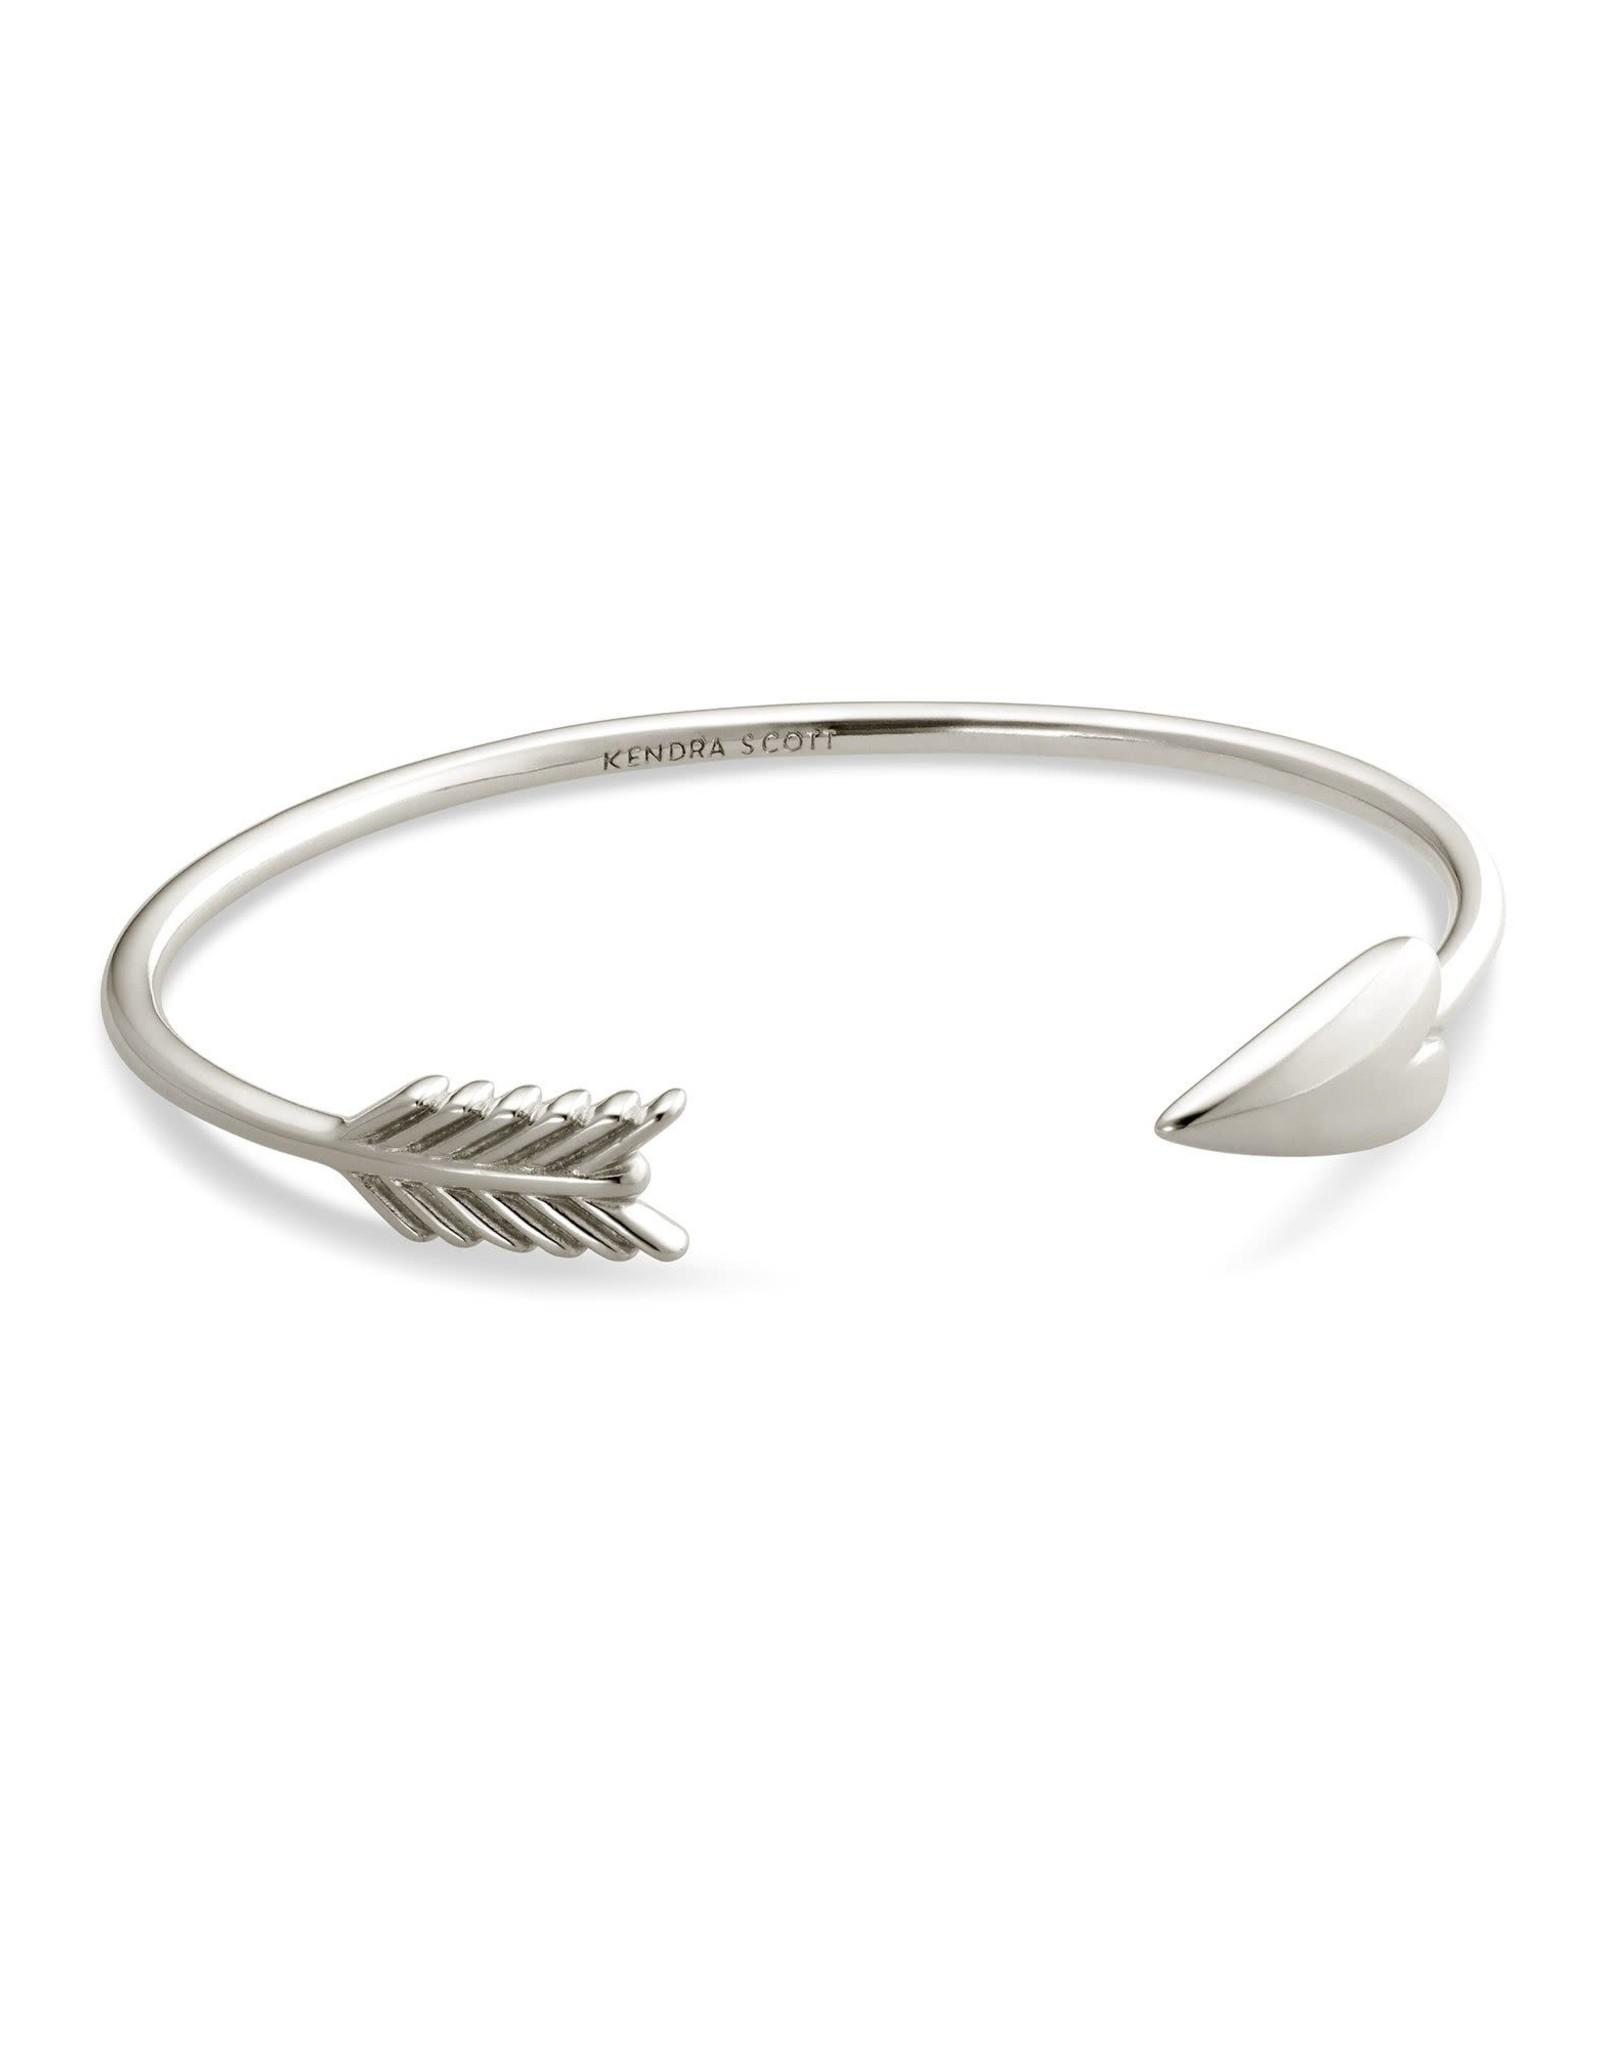 Kendra Scott Zoey Cuff Bracelet - Rhodium Metal